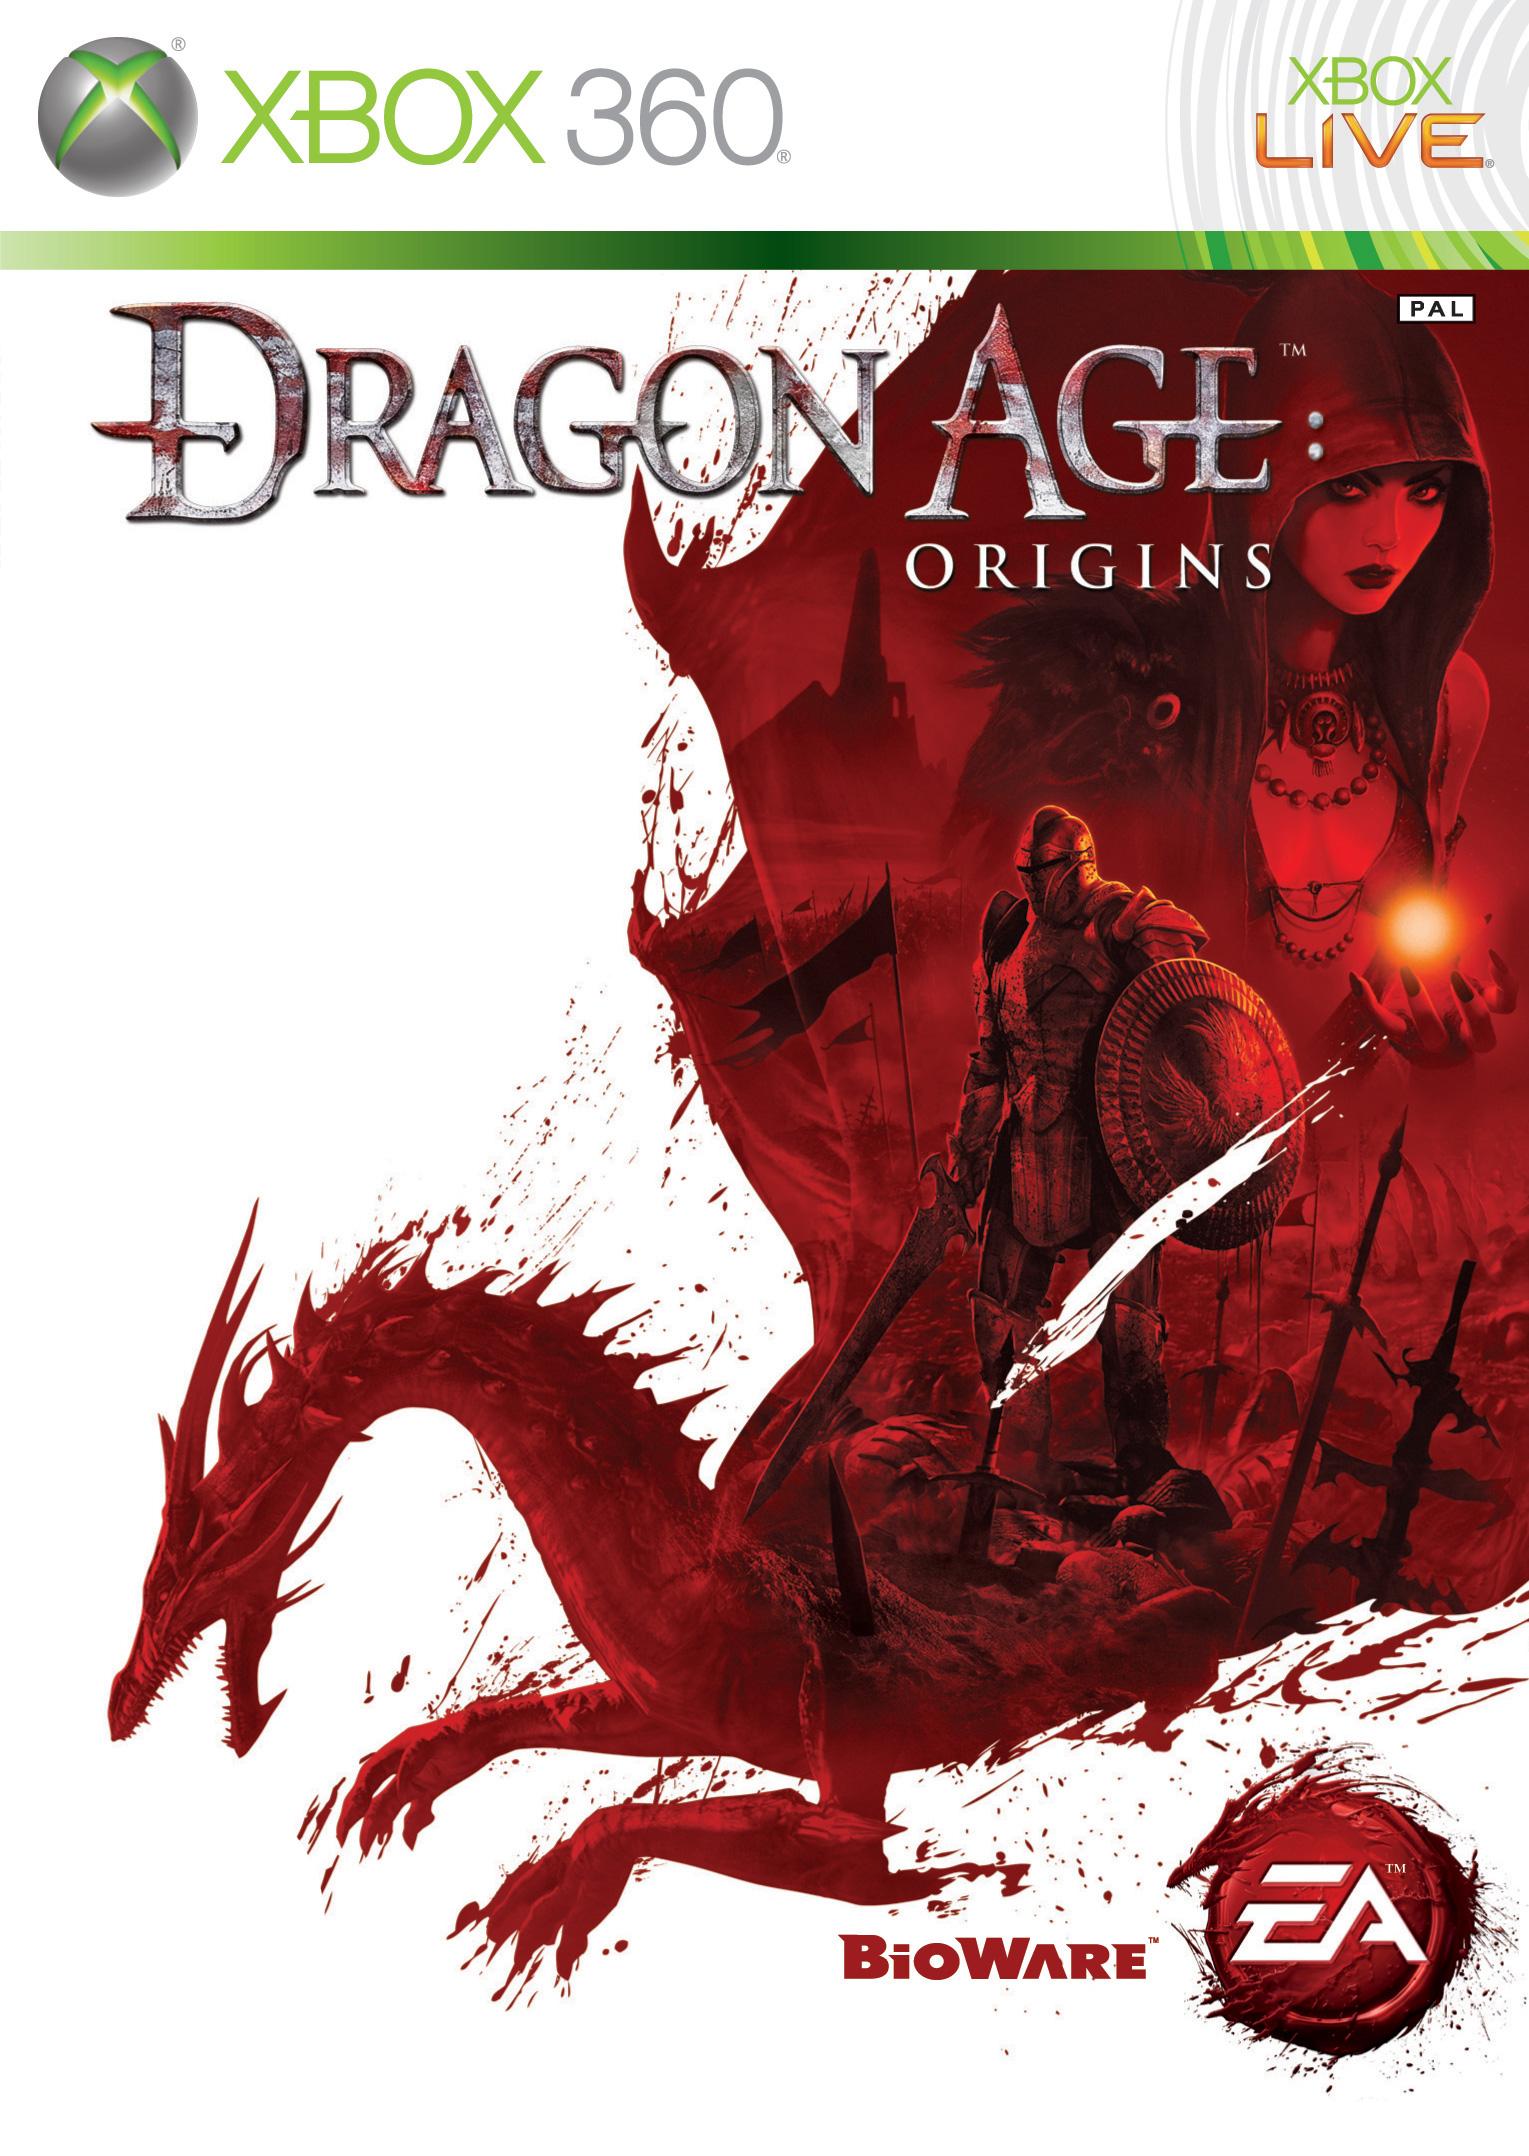 Dragon Age: Origins Xbox 360